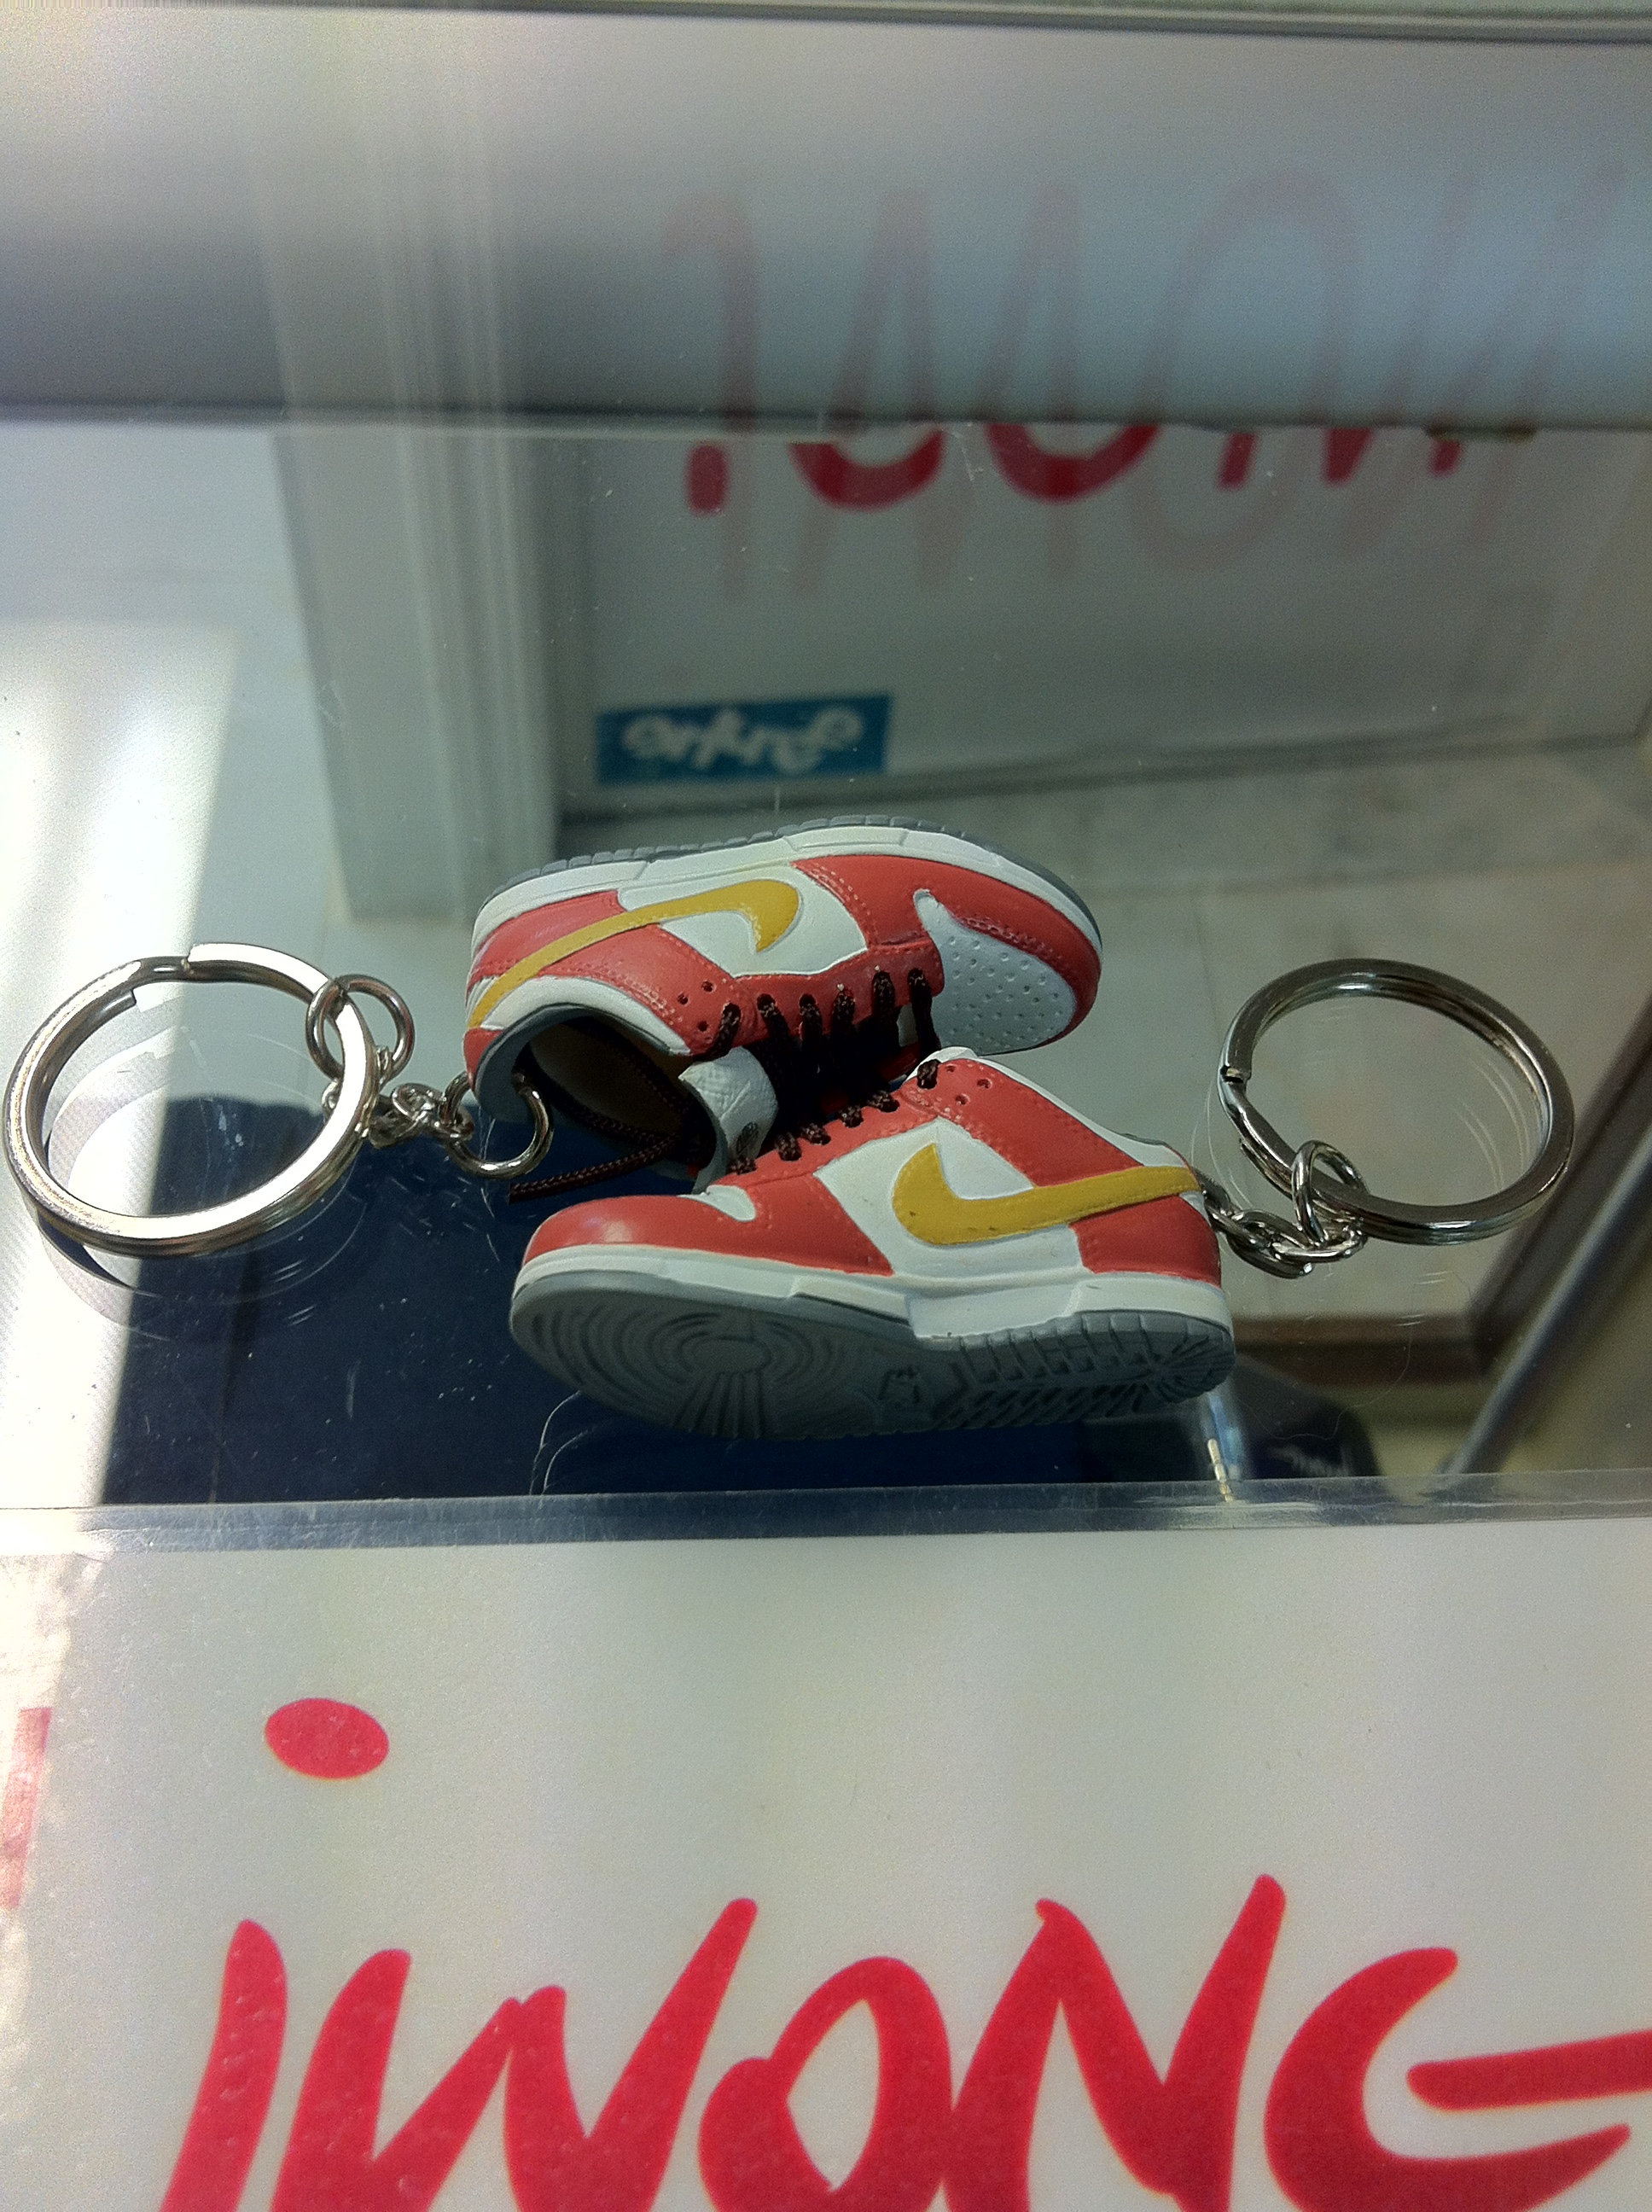 new product cdef9 f2c7d 2004 Nike Dunk SB Low Shanghai 1 Keychain